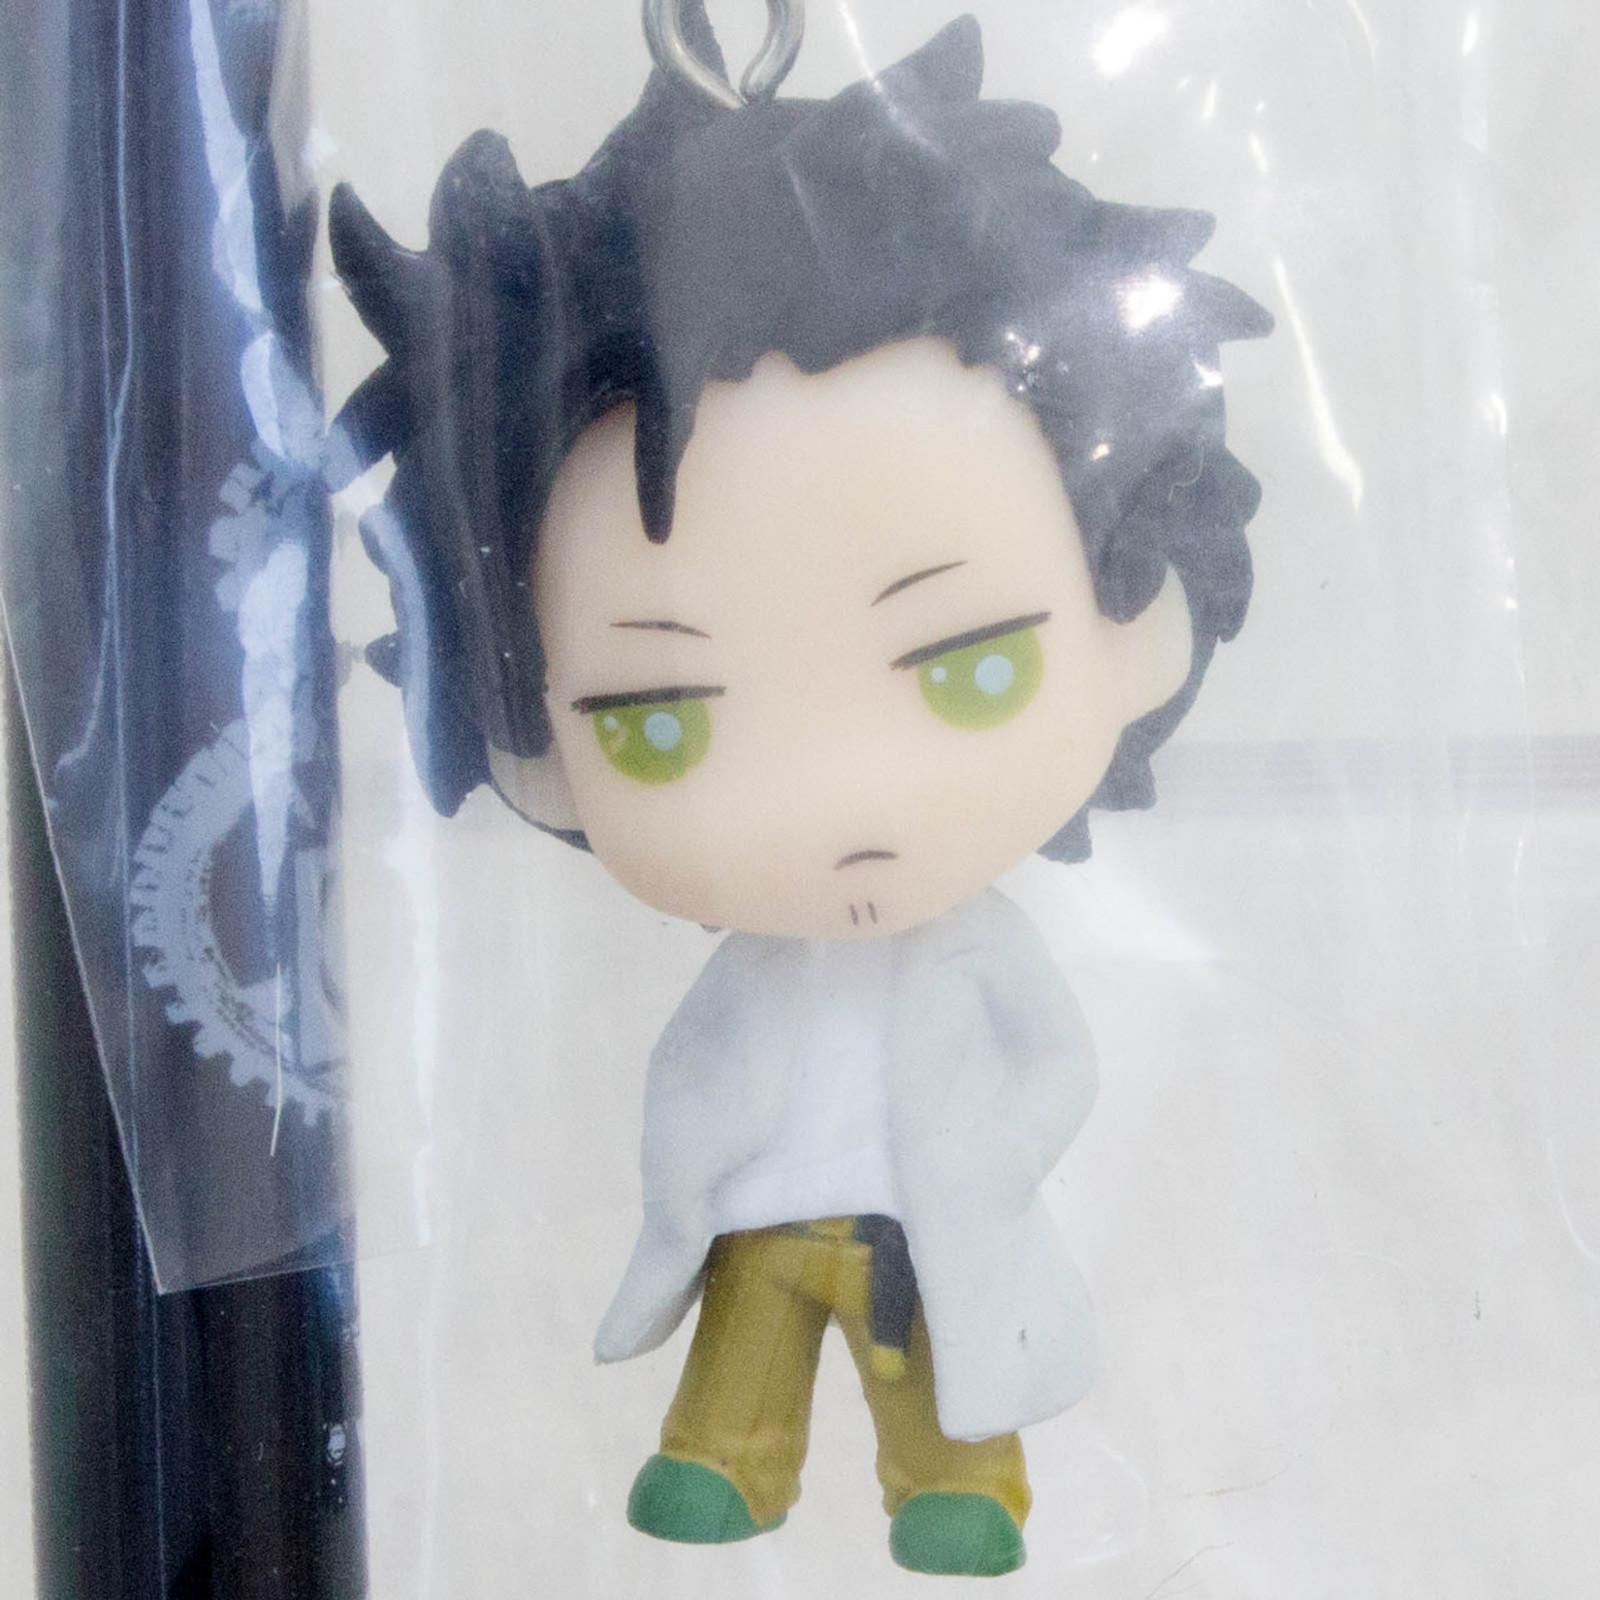 Steins ; Gate Rintaro Okabe Mini Figure Ball Point Pen JAPAN ANIME MANGA